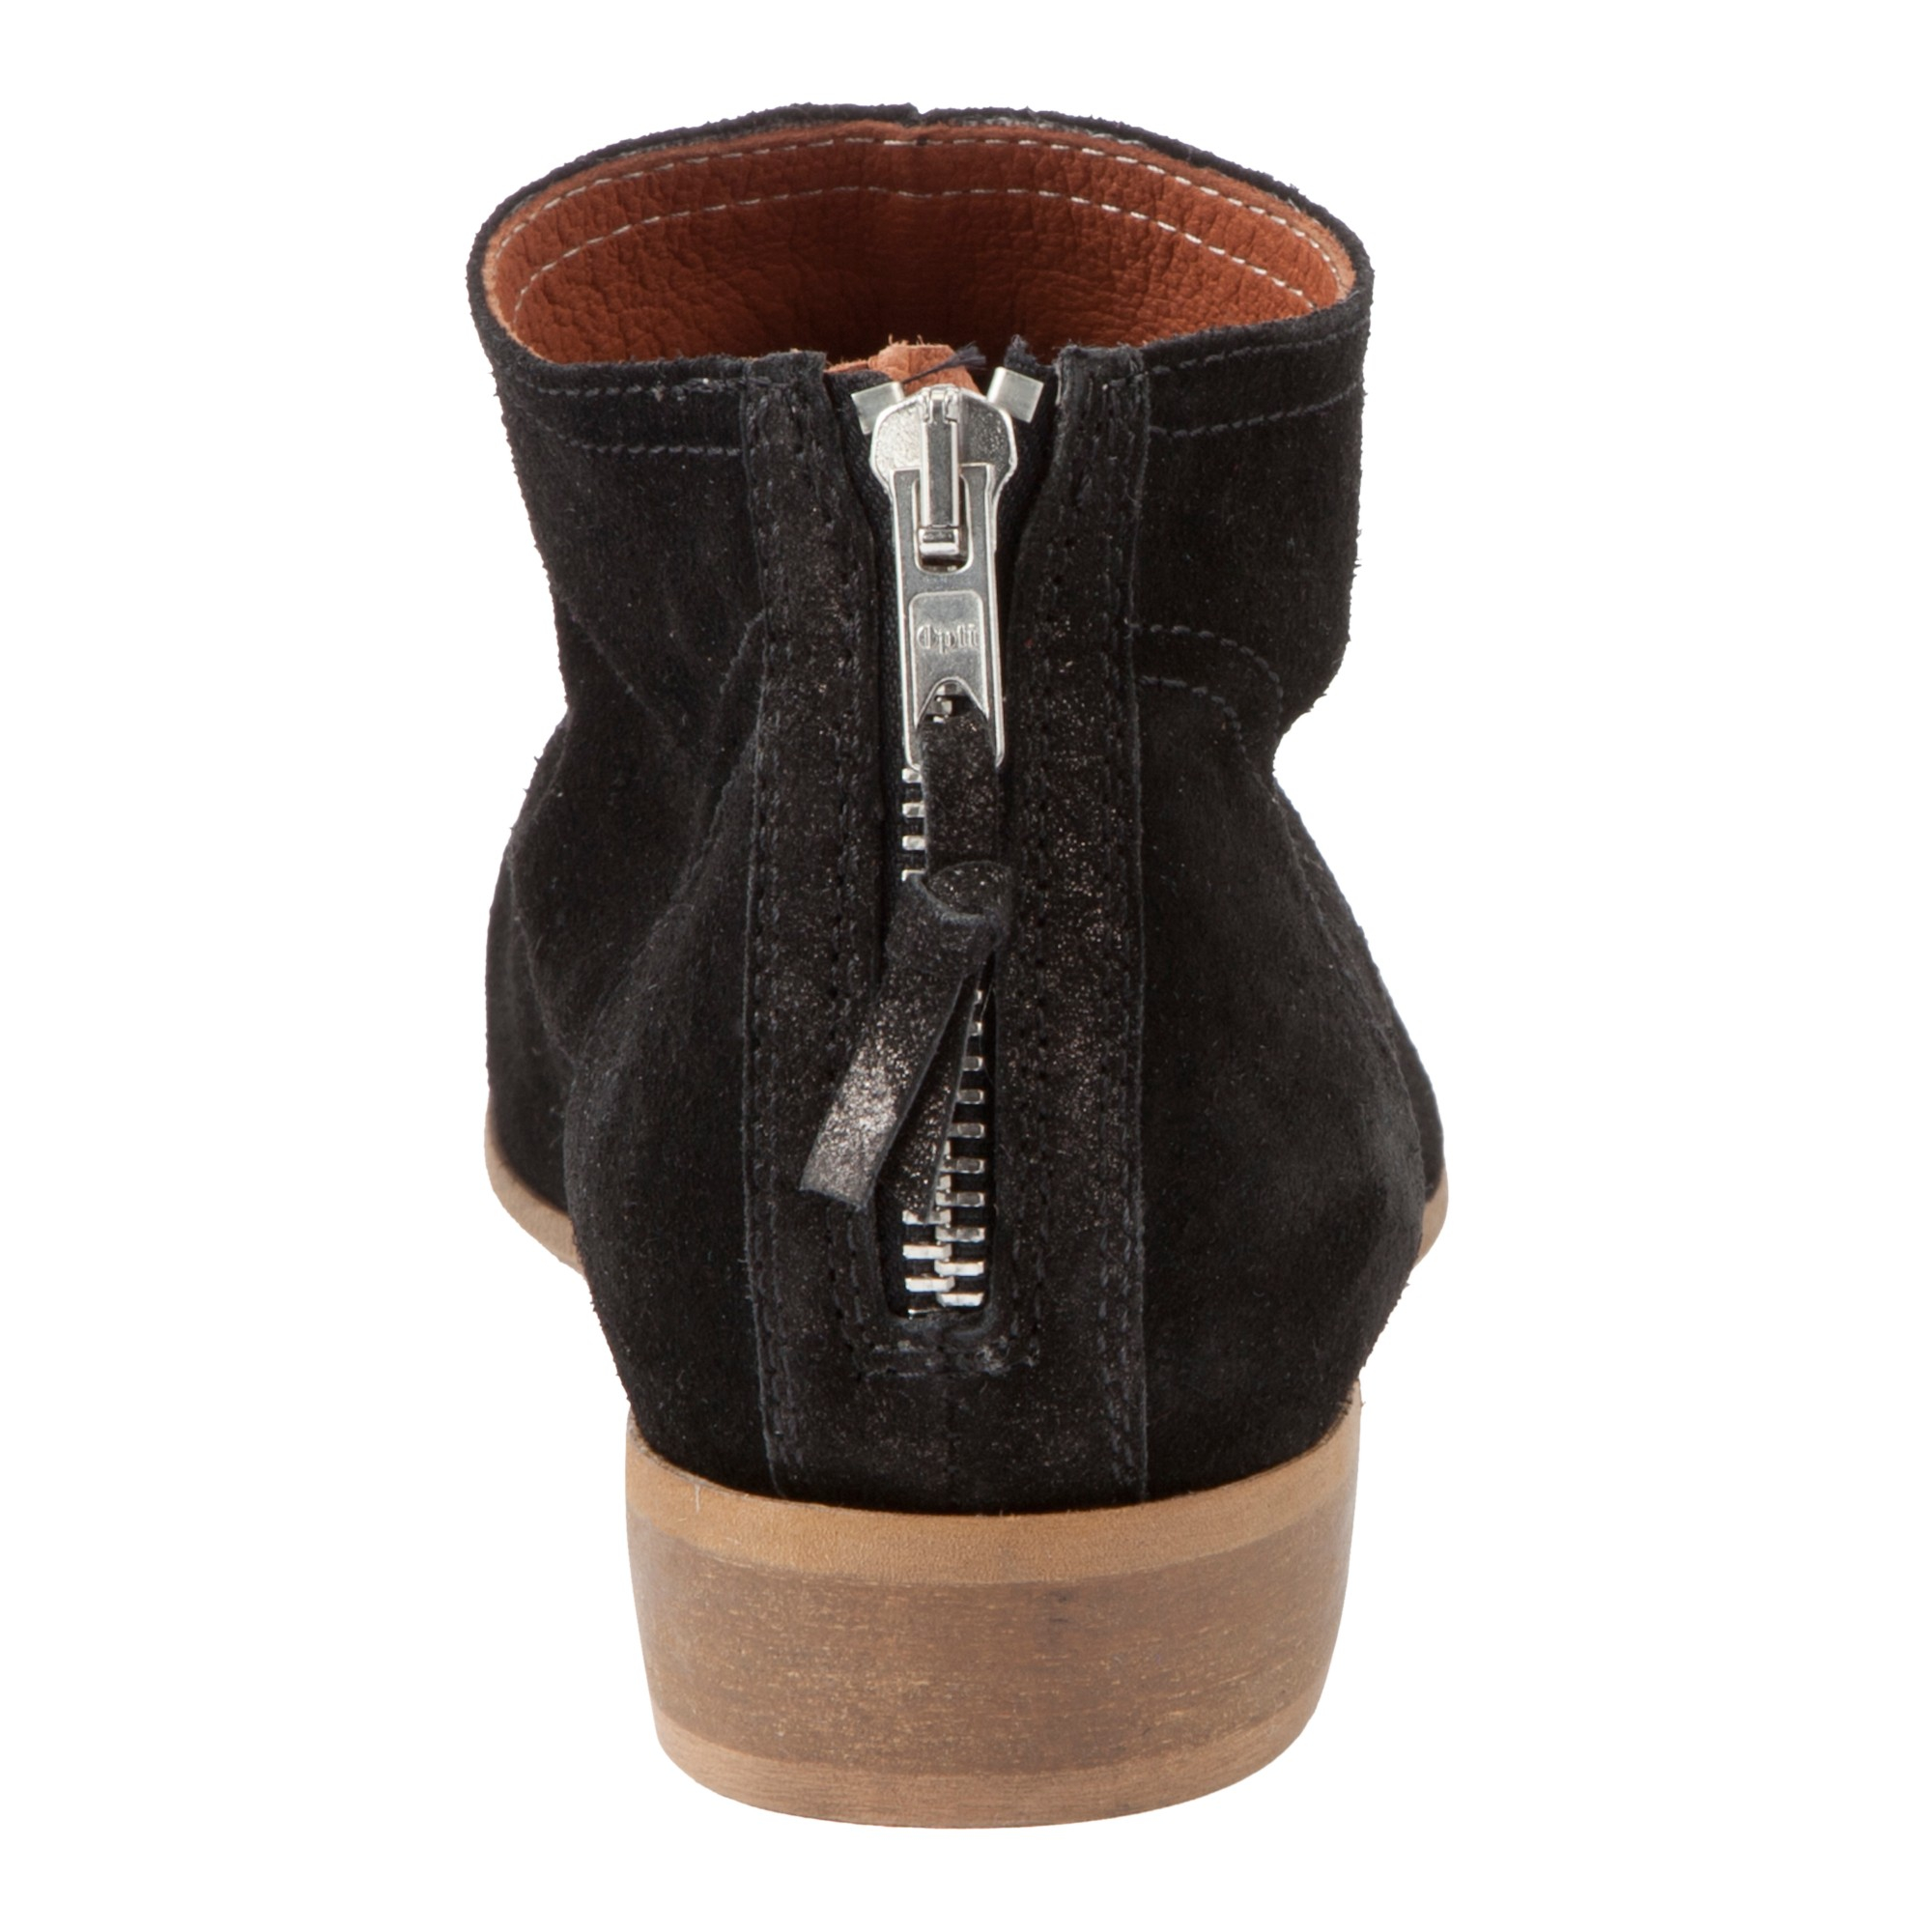 John Lewis Harvard Ankle Boots in Black